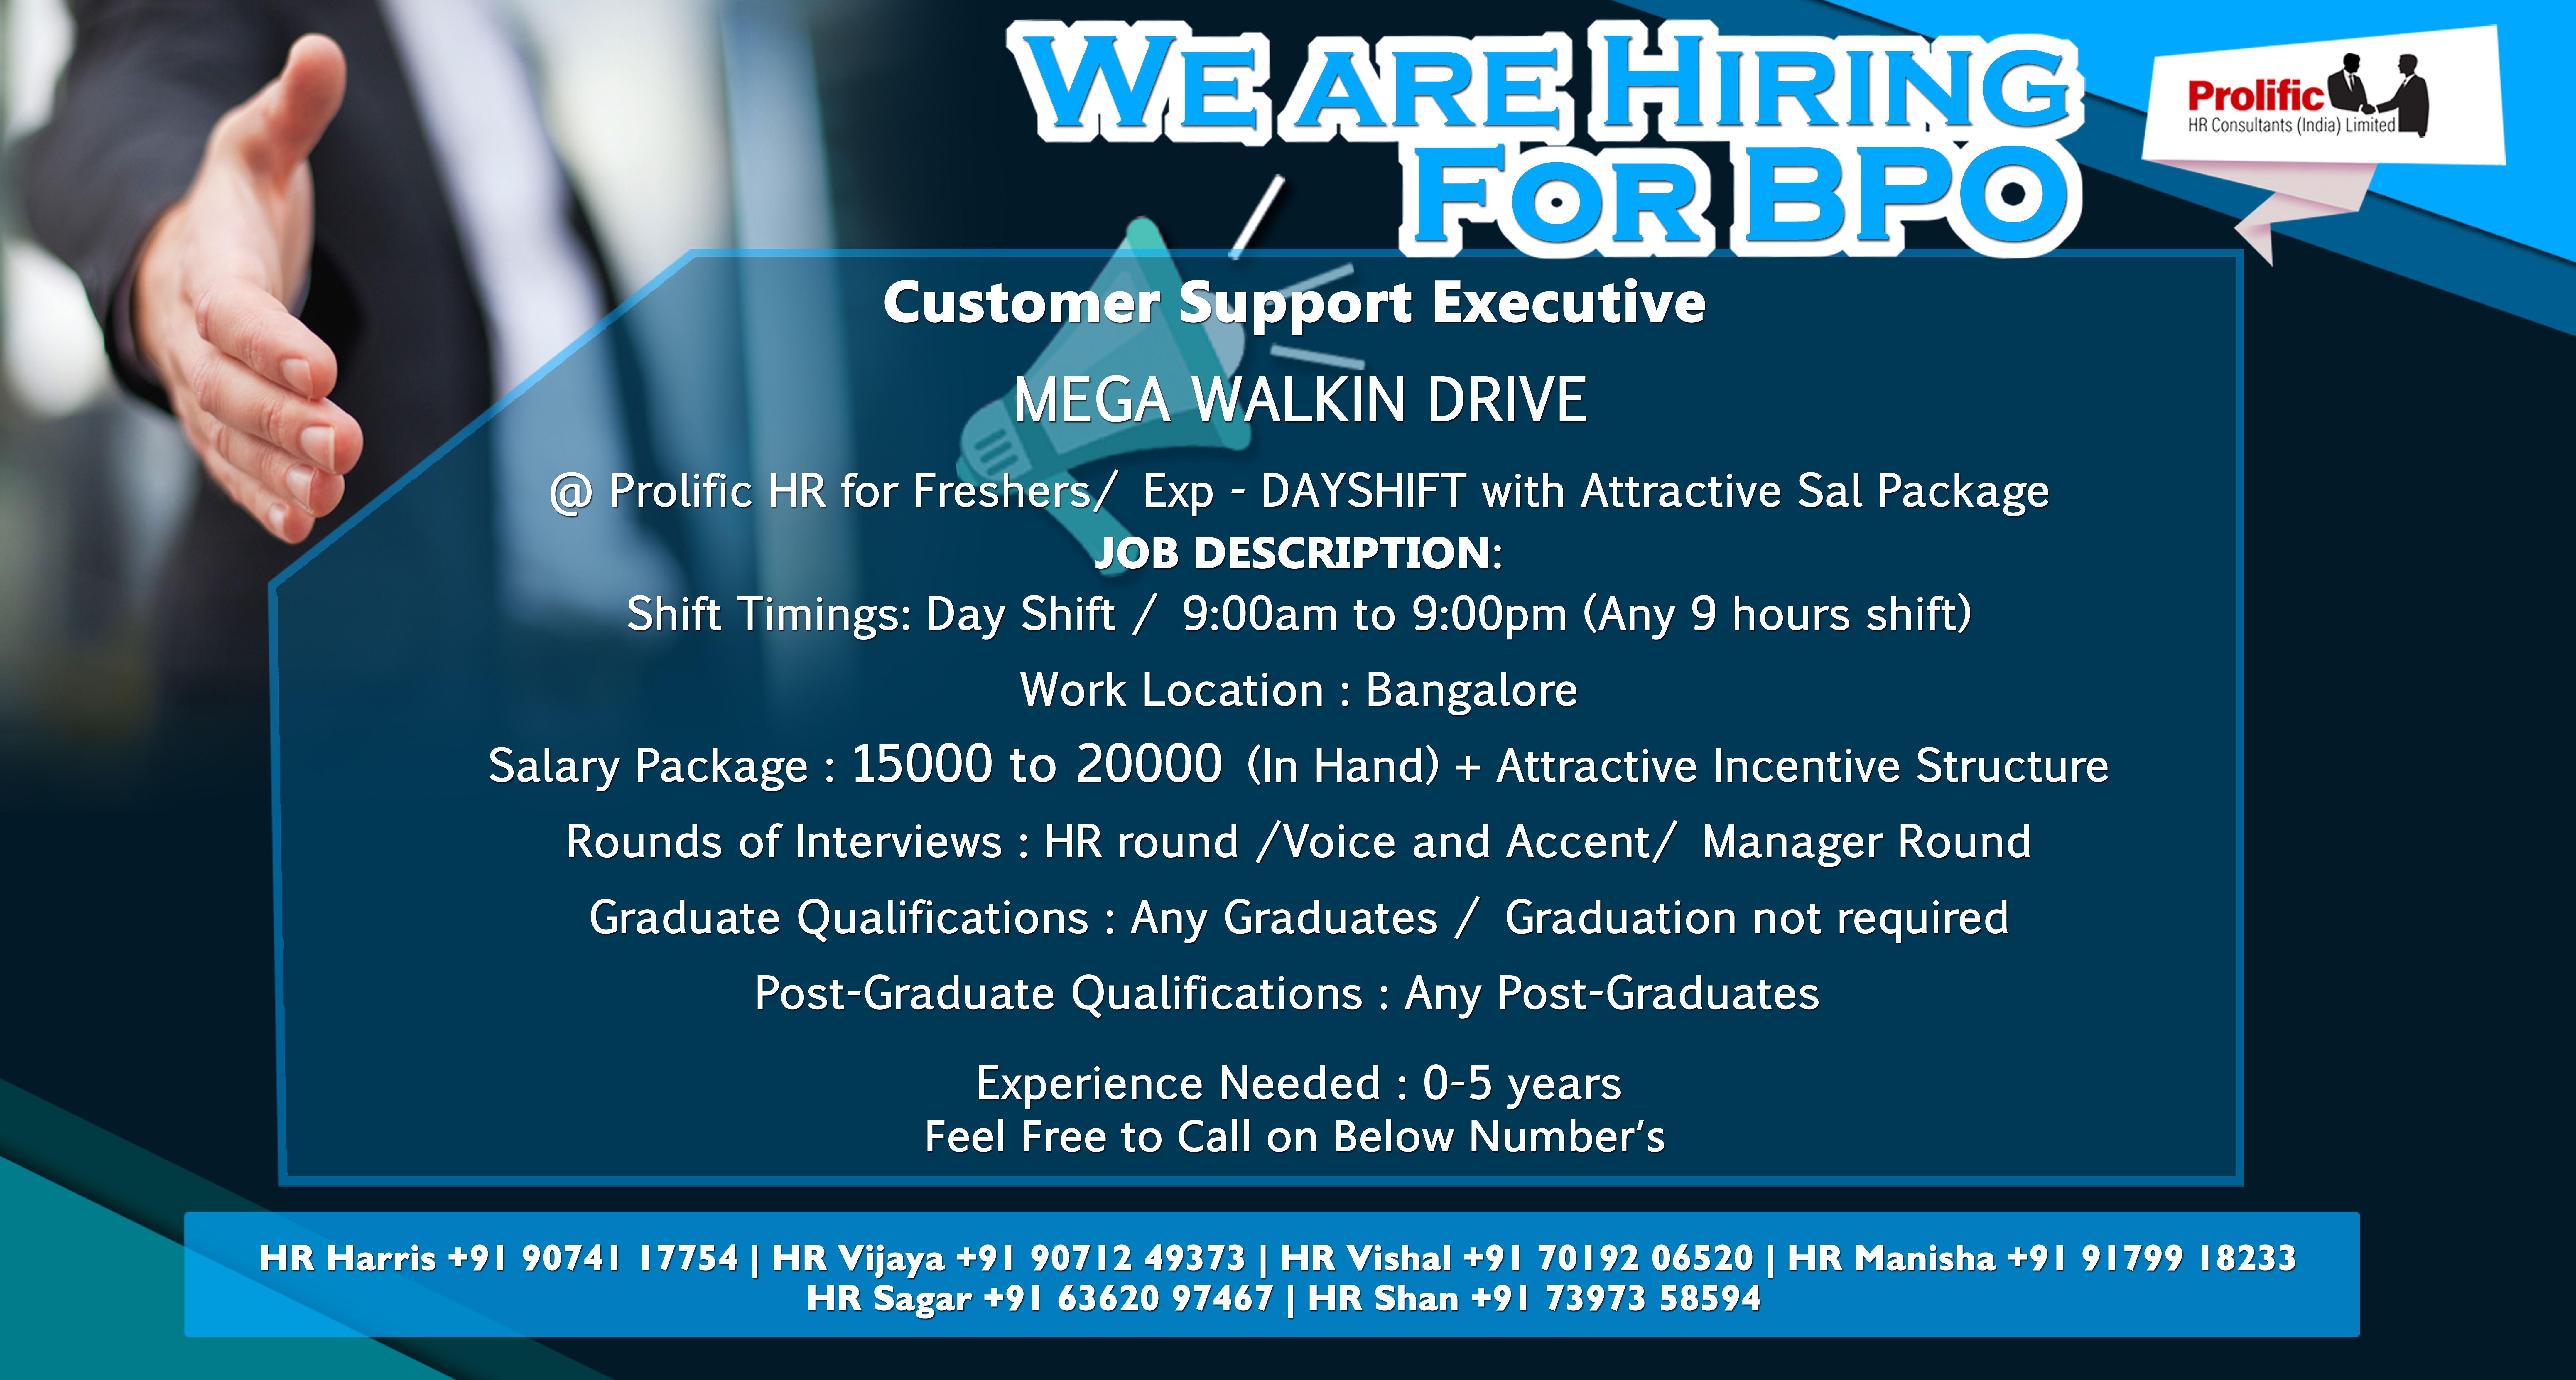 Bpo jobs in bangalore job bangalore job placement